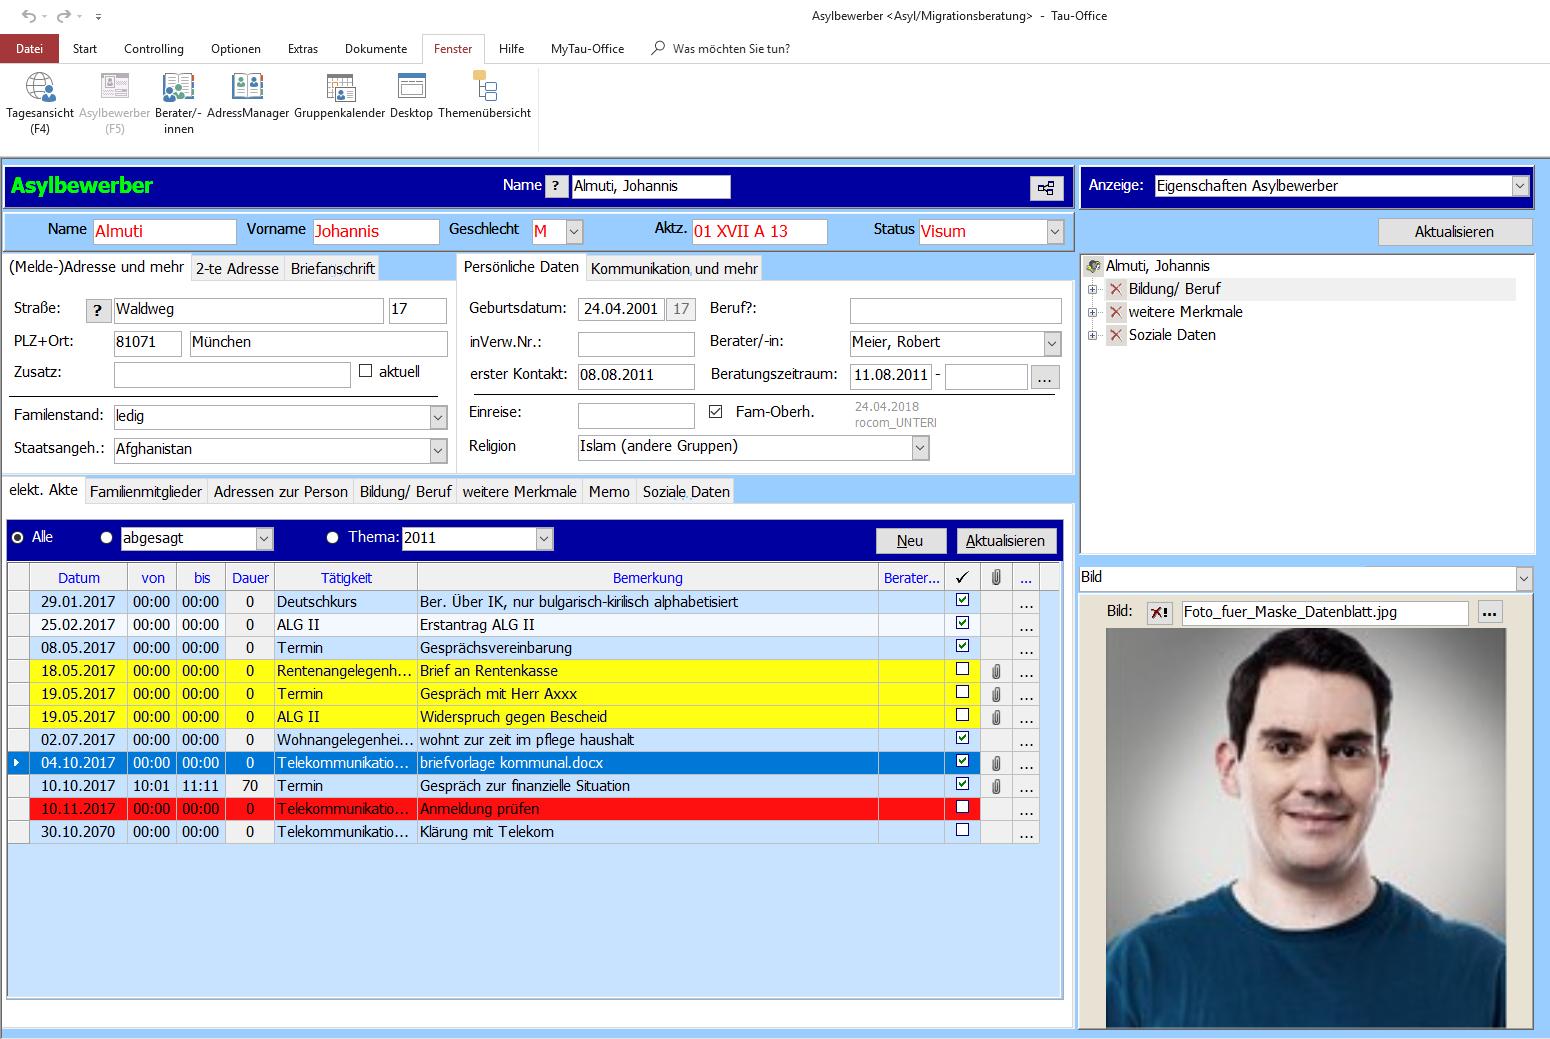 Asylbewerber elektronische Akte (E-Akte) Tau-Office Asyl/Migrationsberatung